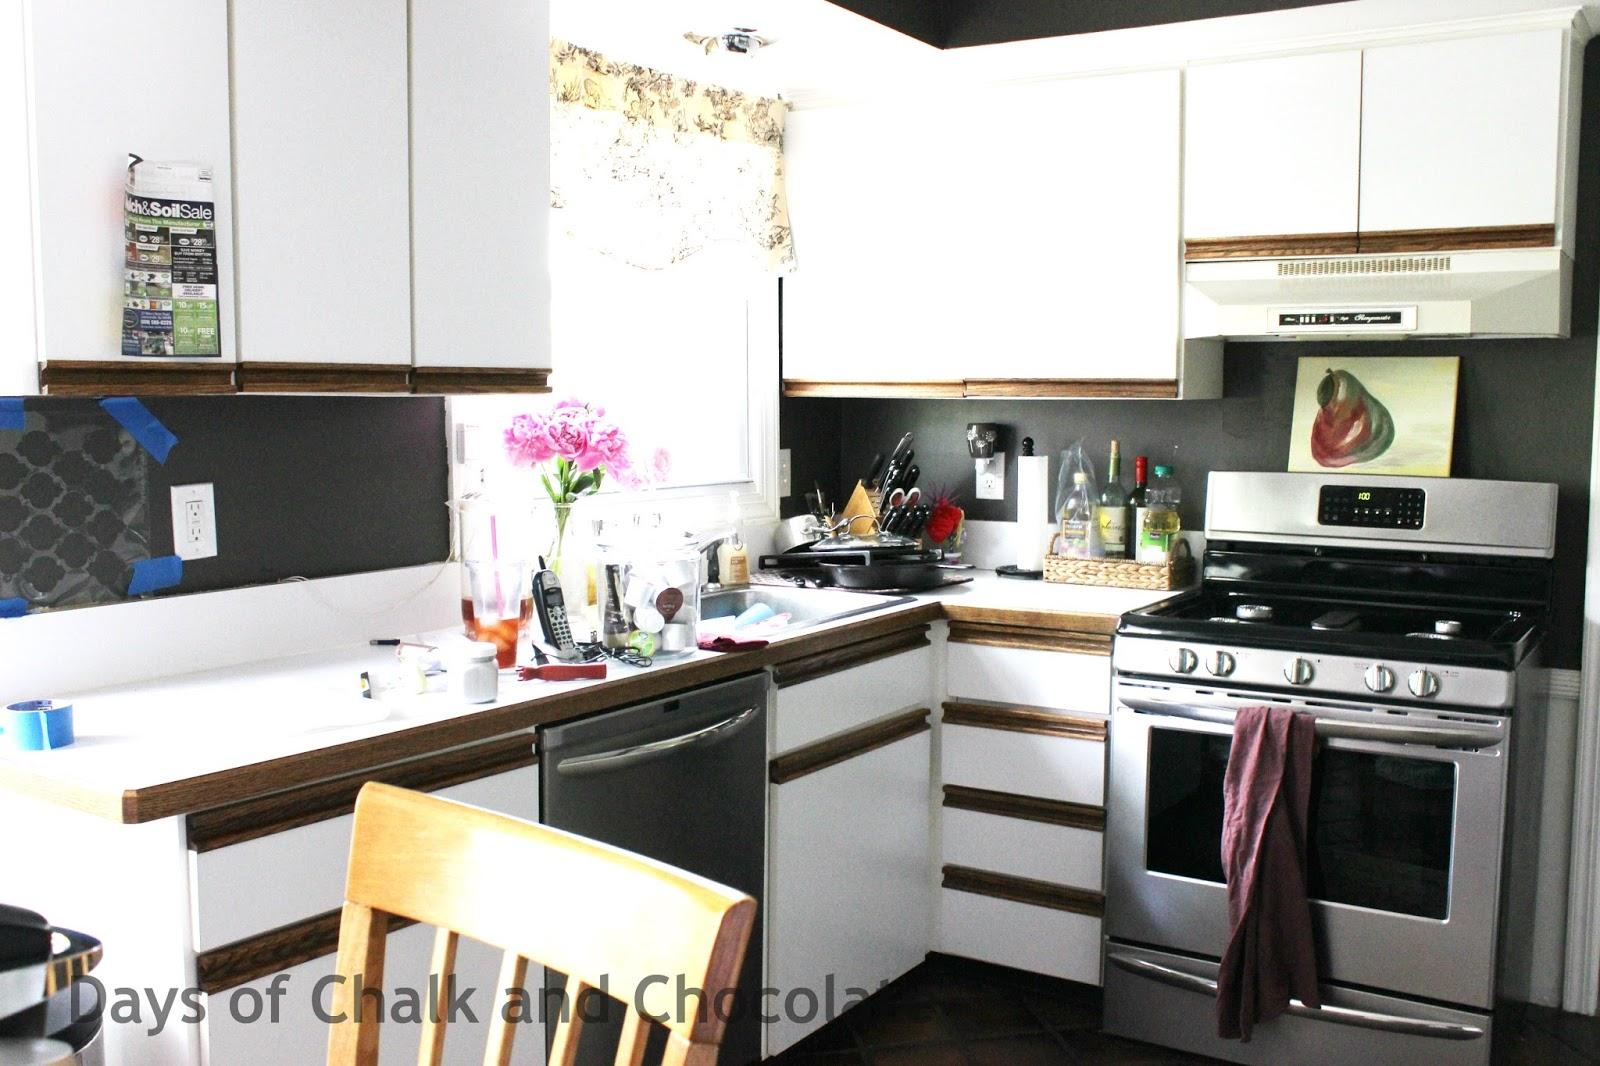 Creative Inexpensive Kitchen Backsplash - audreycouture